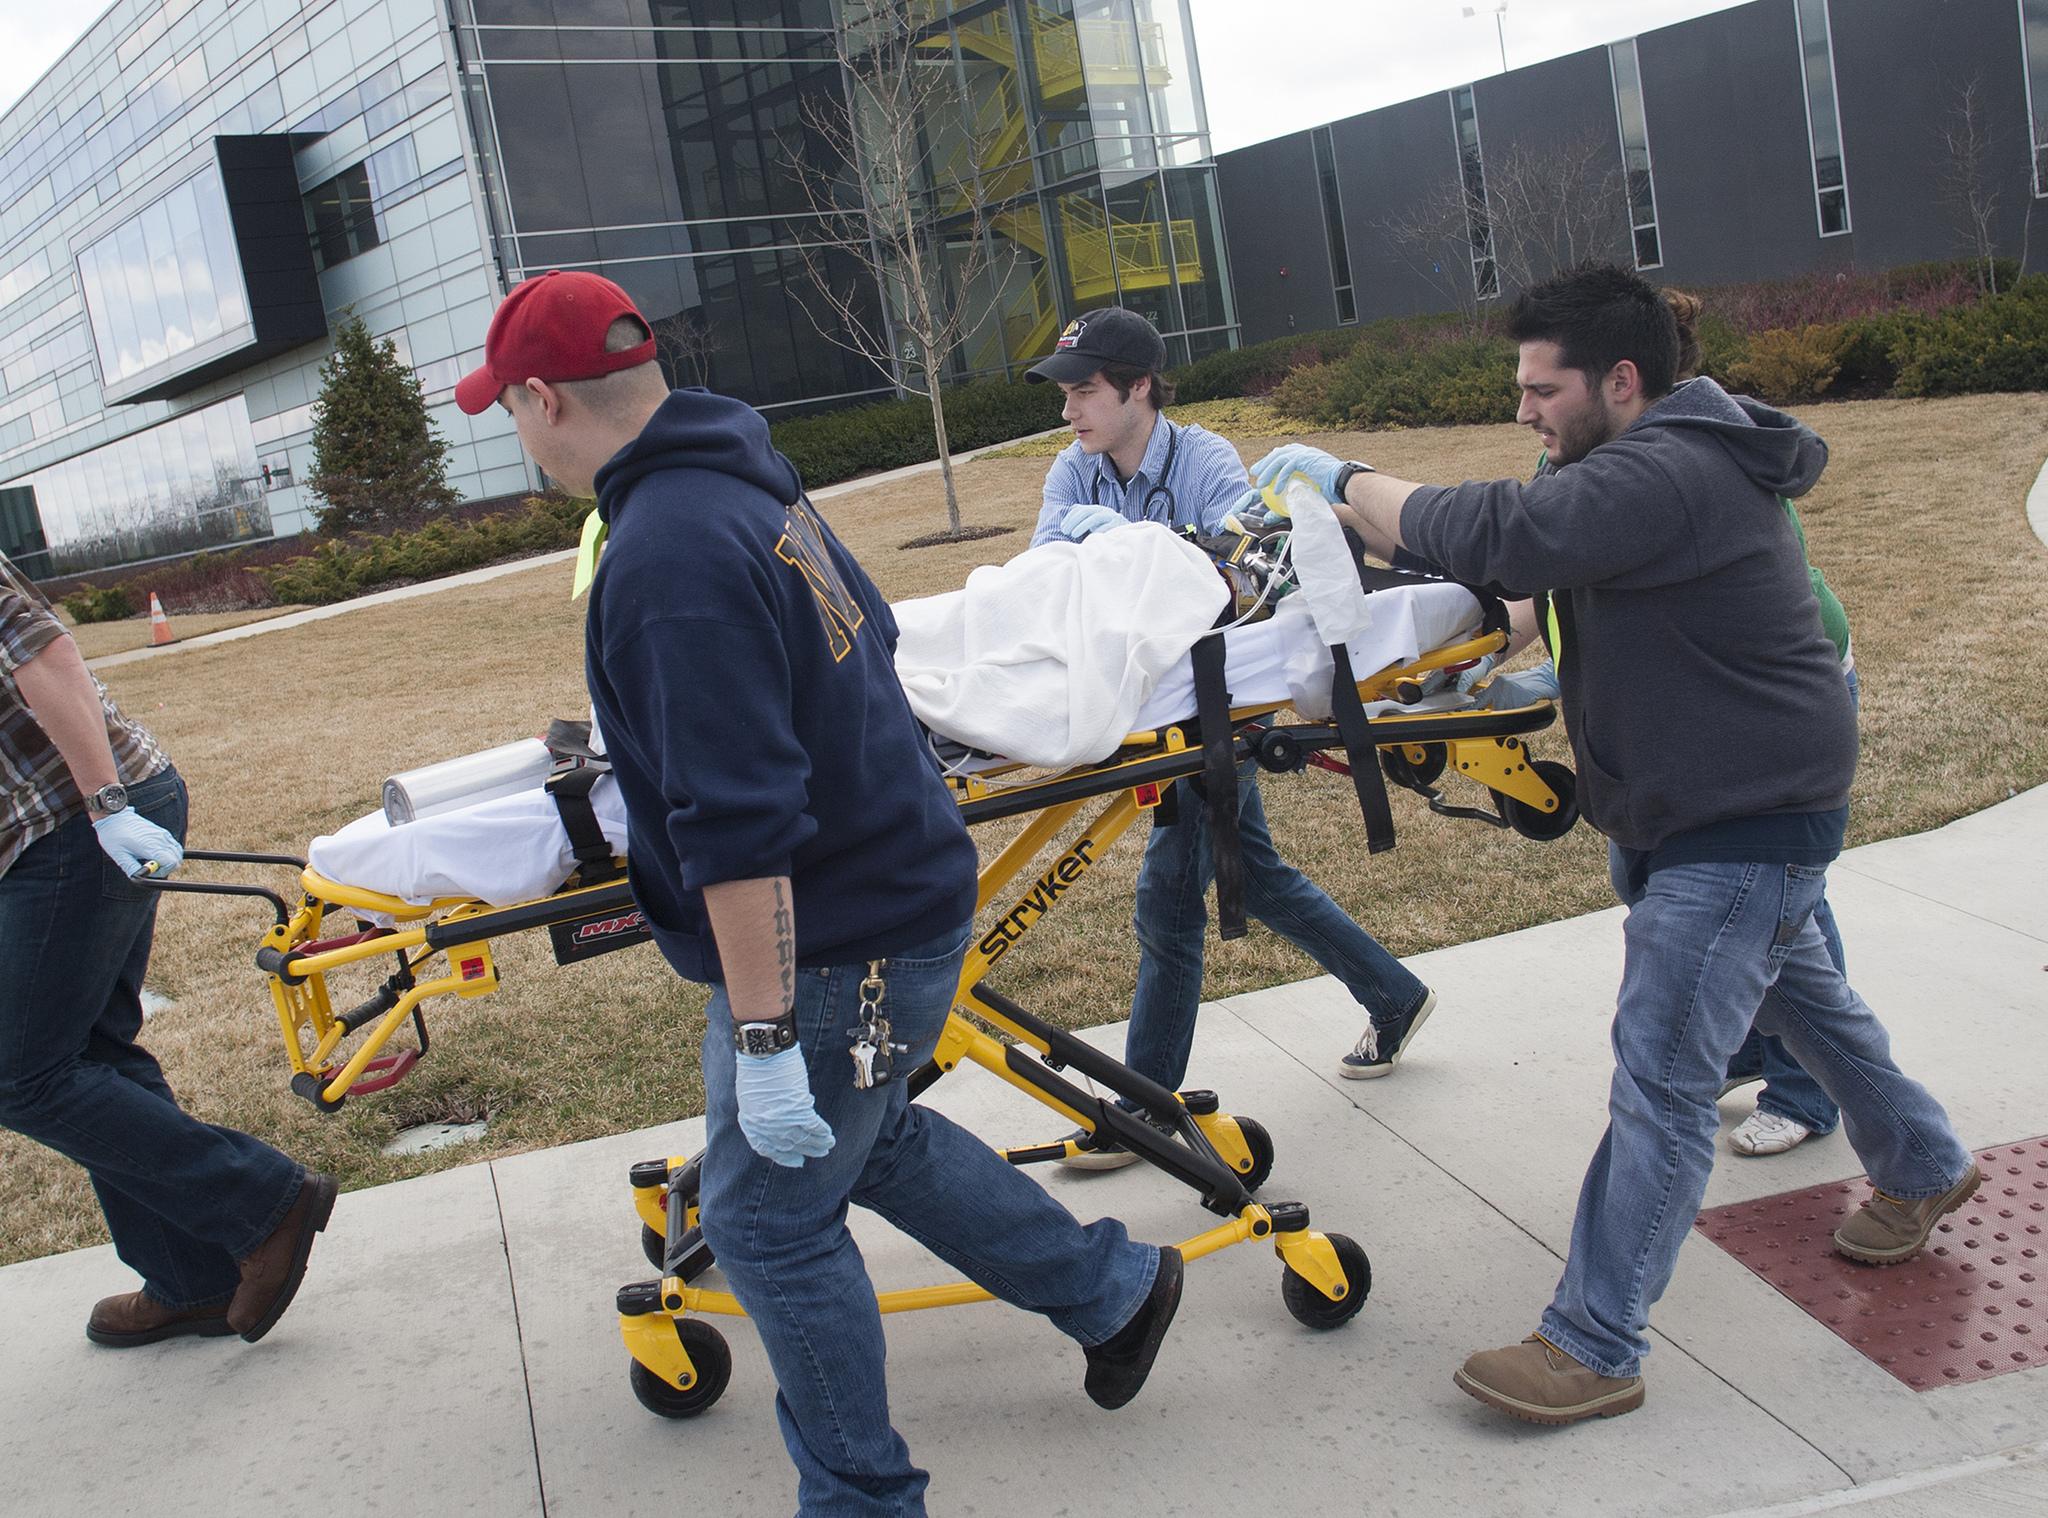 EMT/Nursing Pediatric Emergency Simulation - April 2013 4, COD Newsroom April 8, 2013